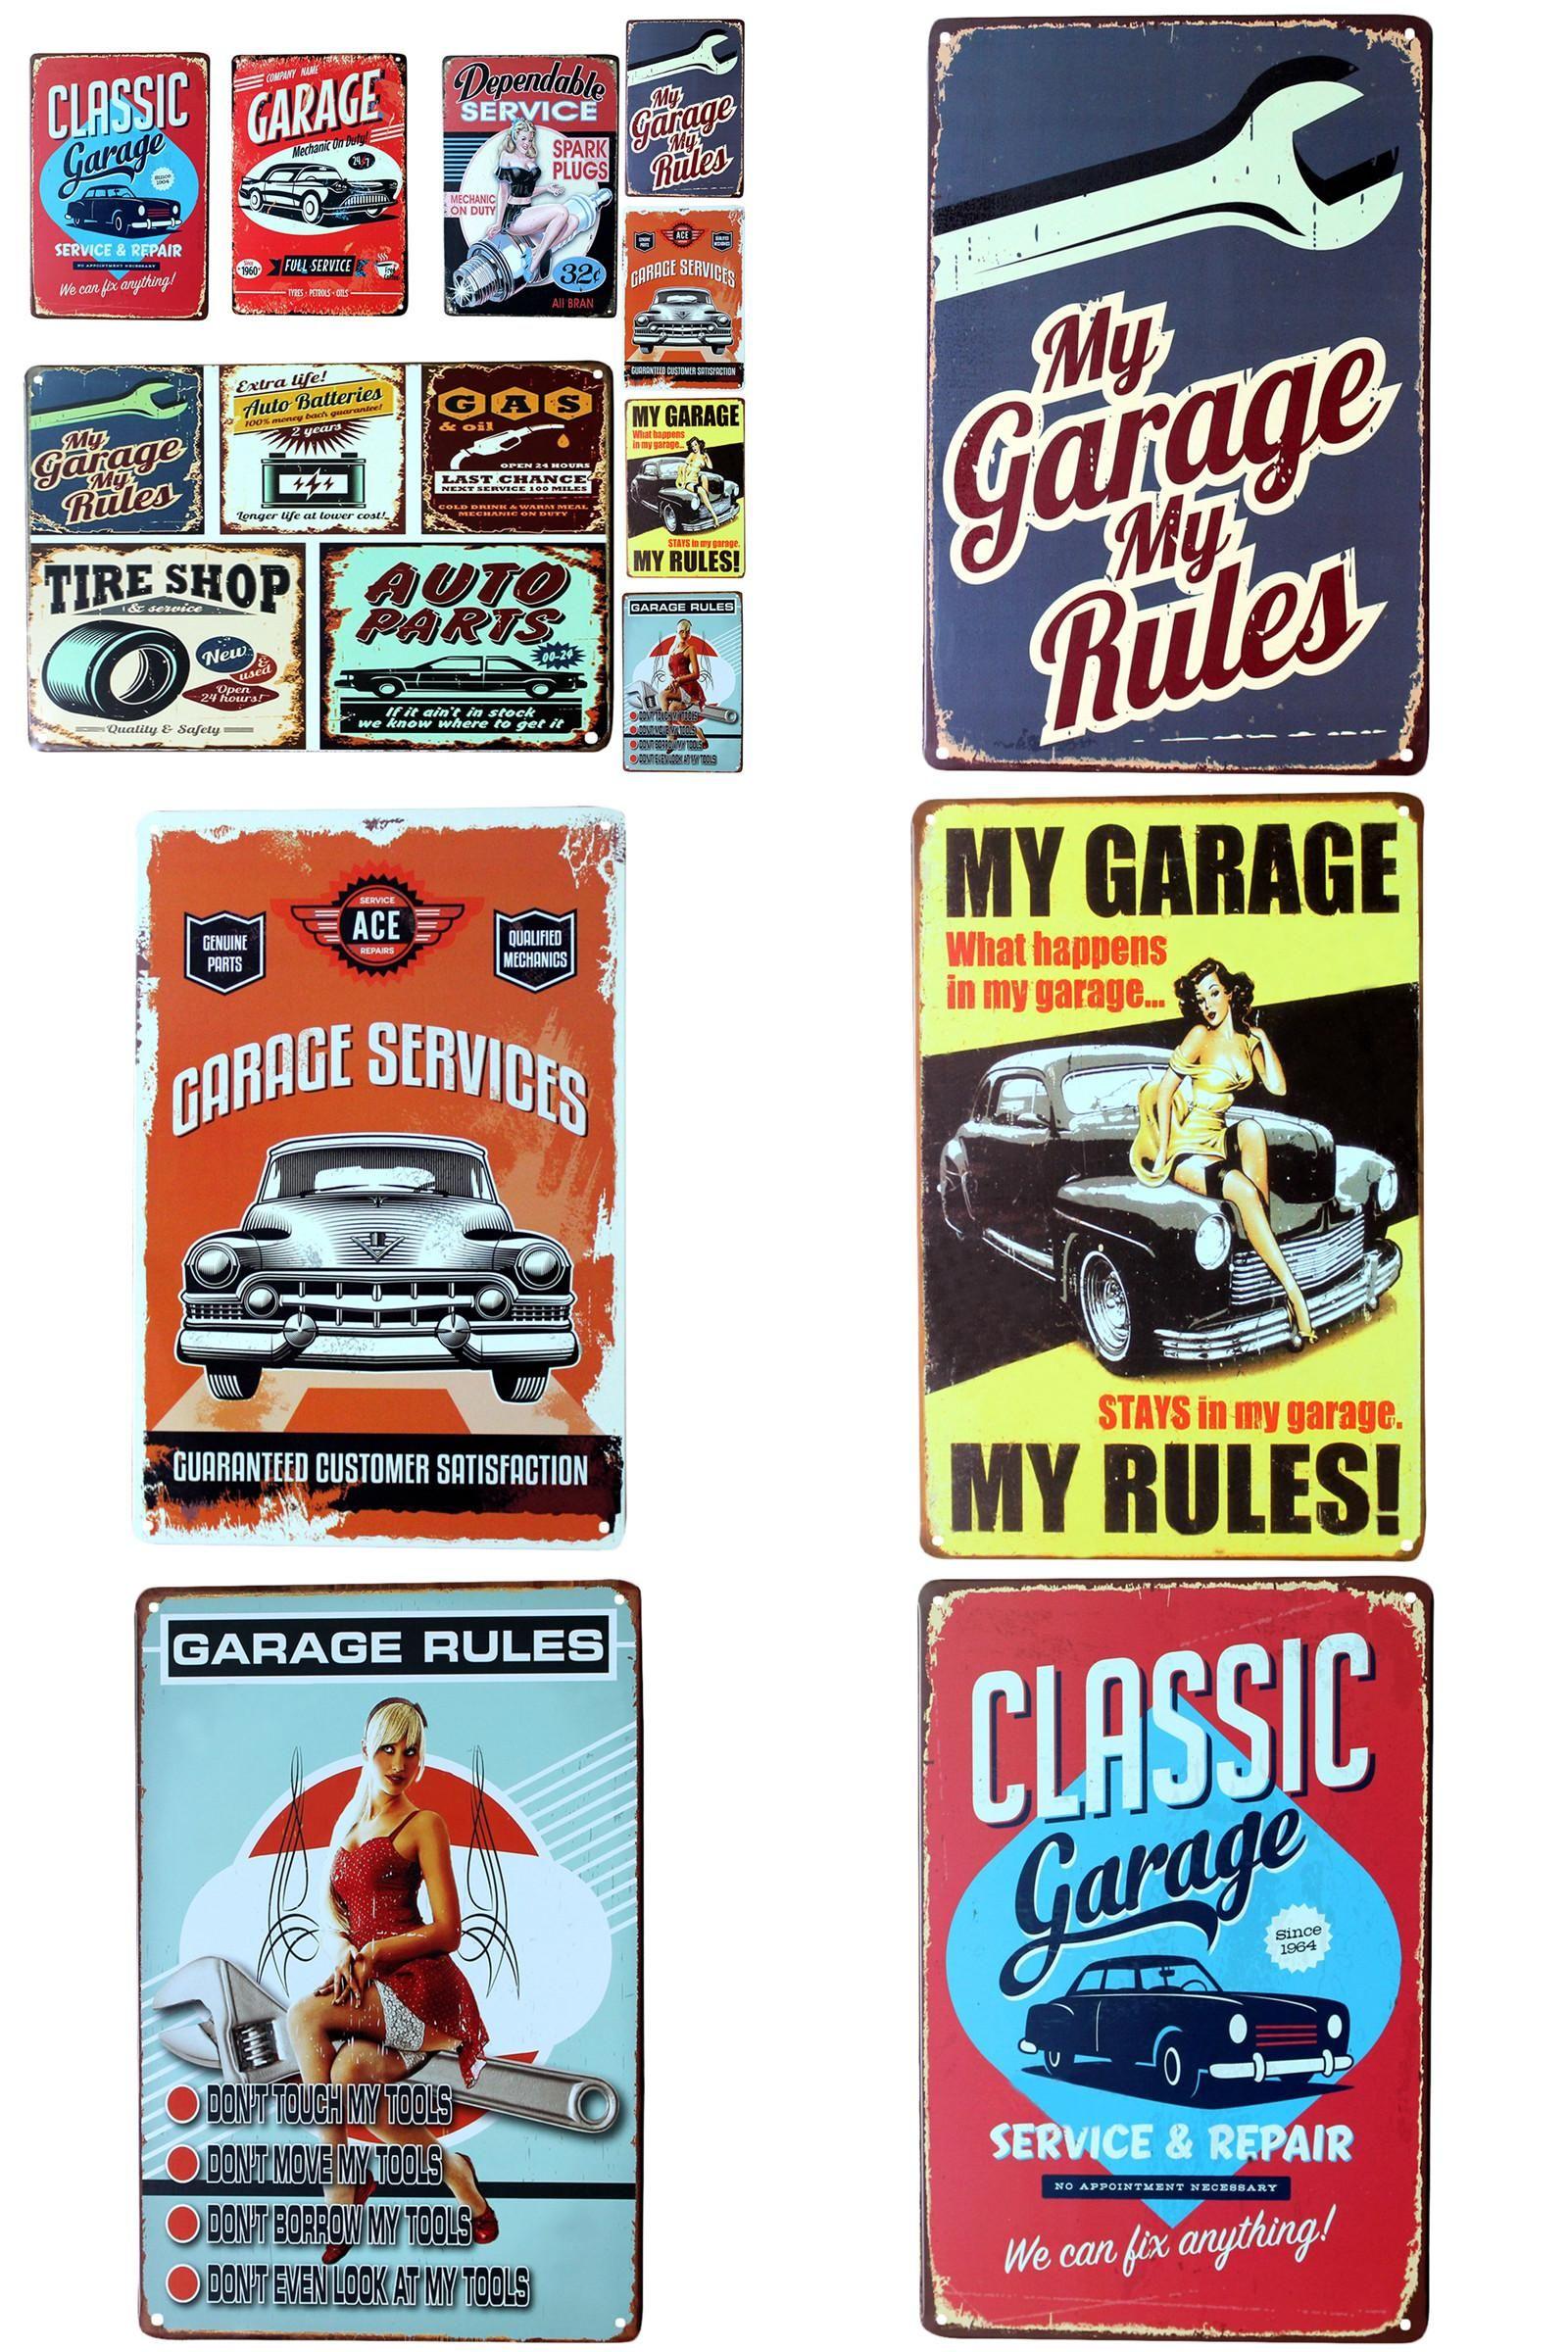 BMW Vintage REPRODUCTION Metal Sign Garage Sign Garage Services Metal Wall Sign